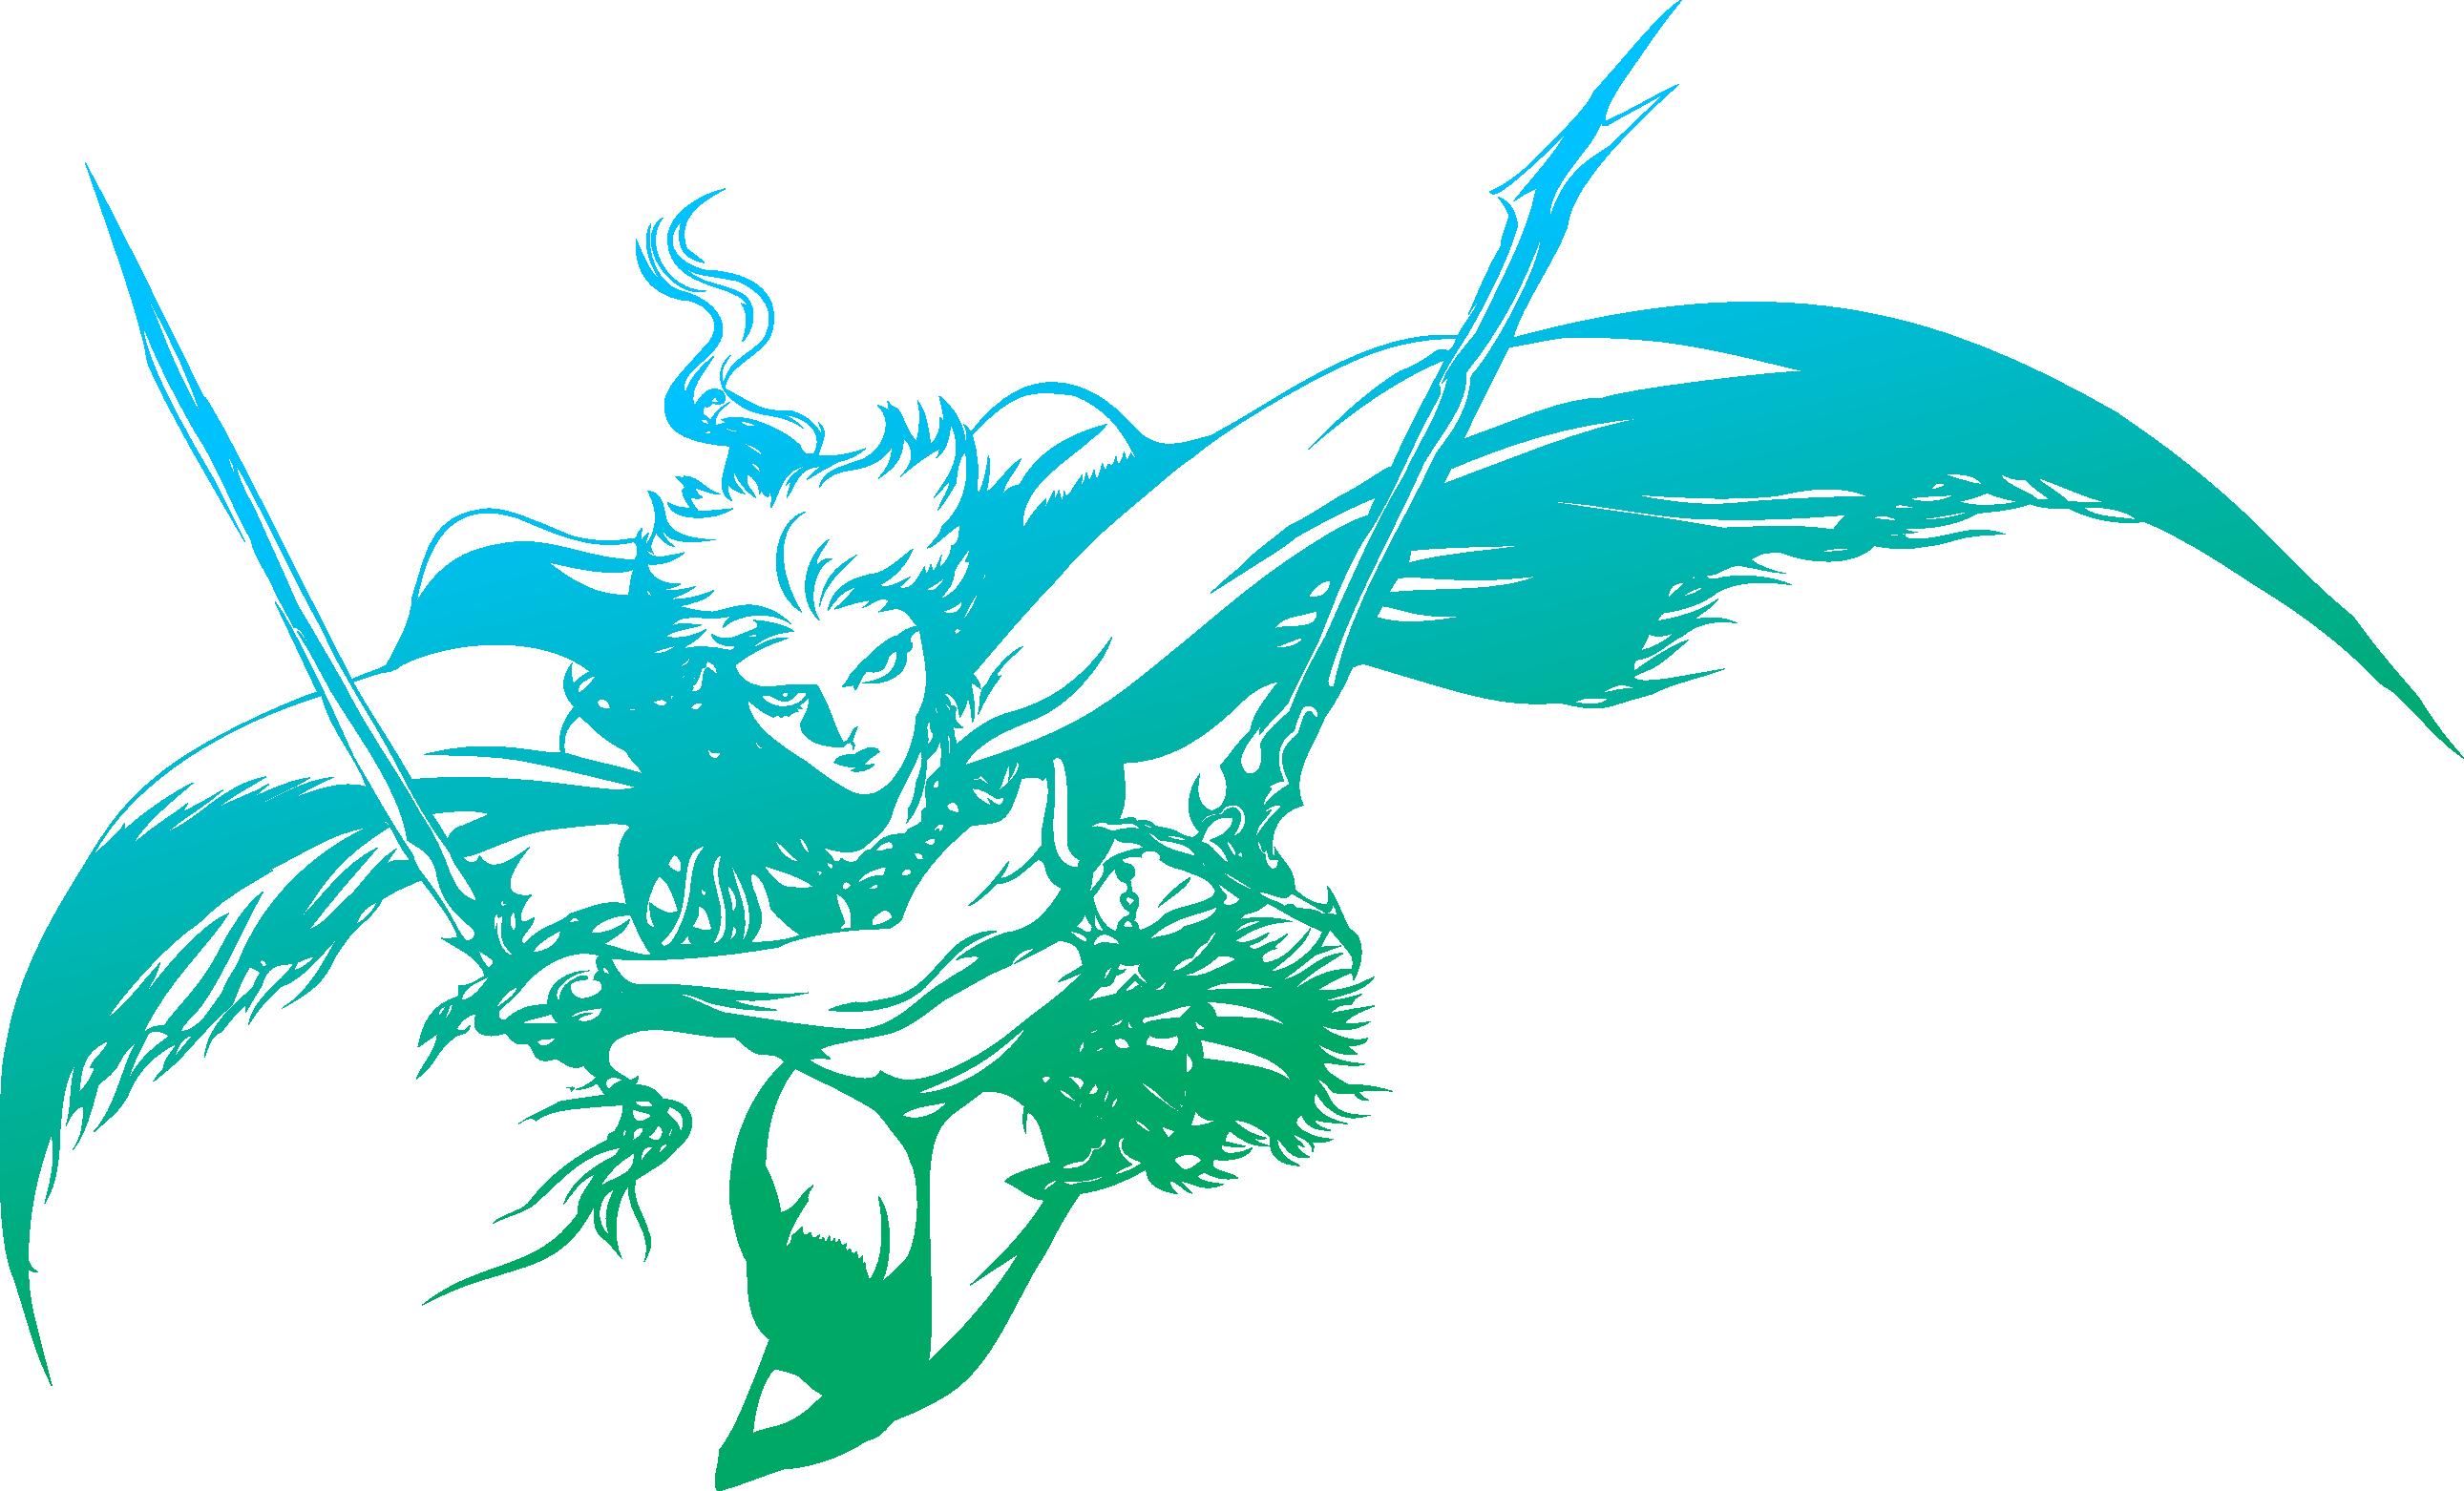 Final fantasy logo art - photo#6